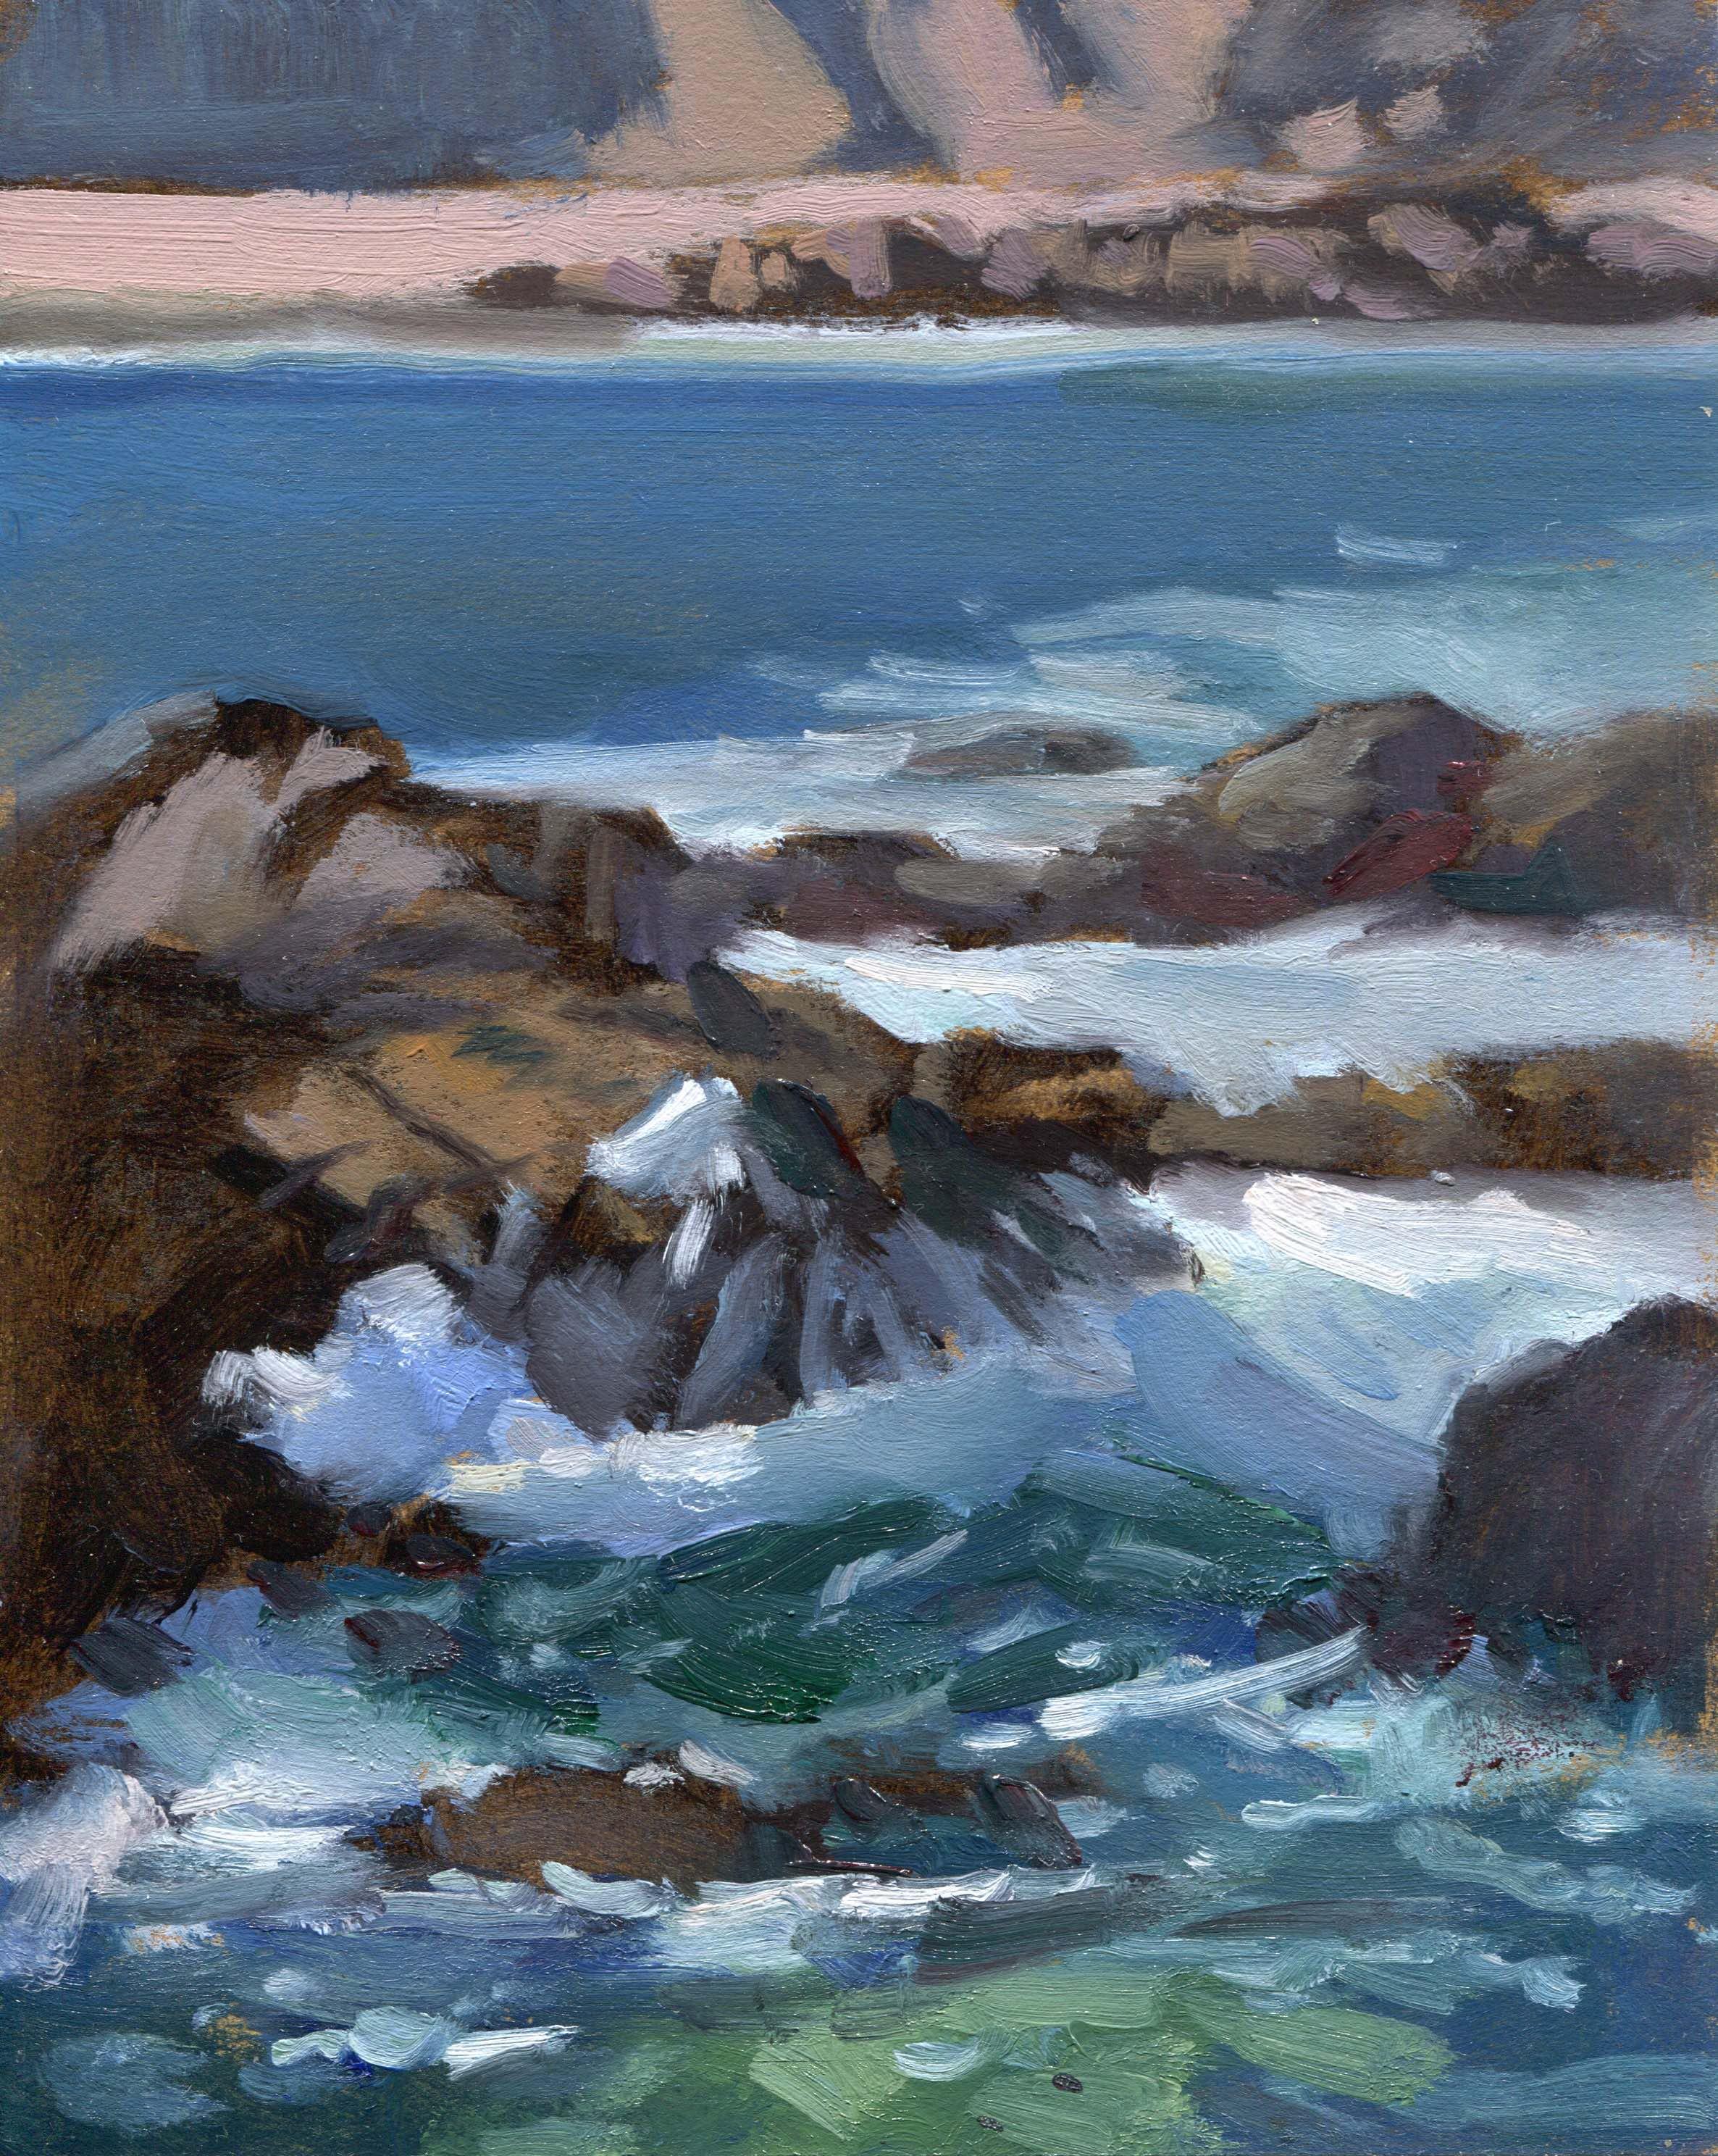 Pacific Grove Rocks & Surf